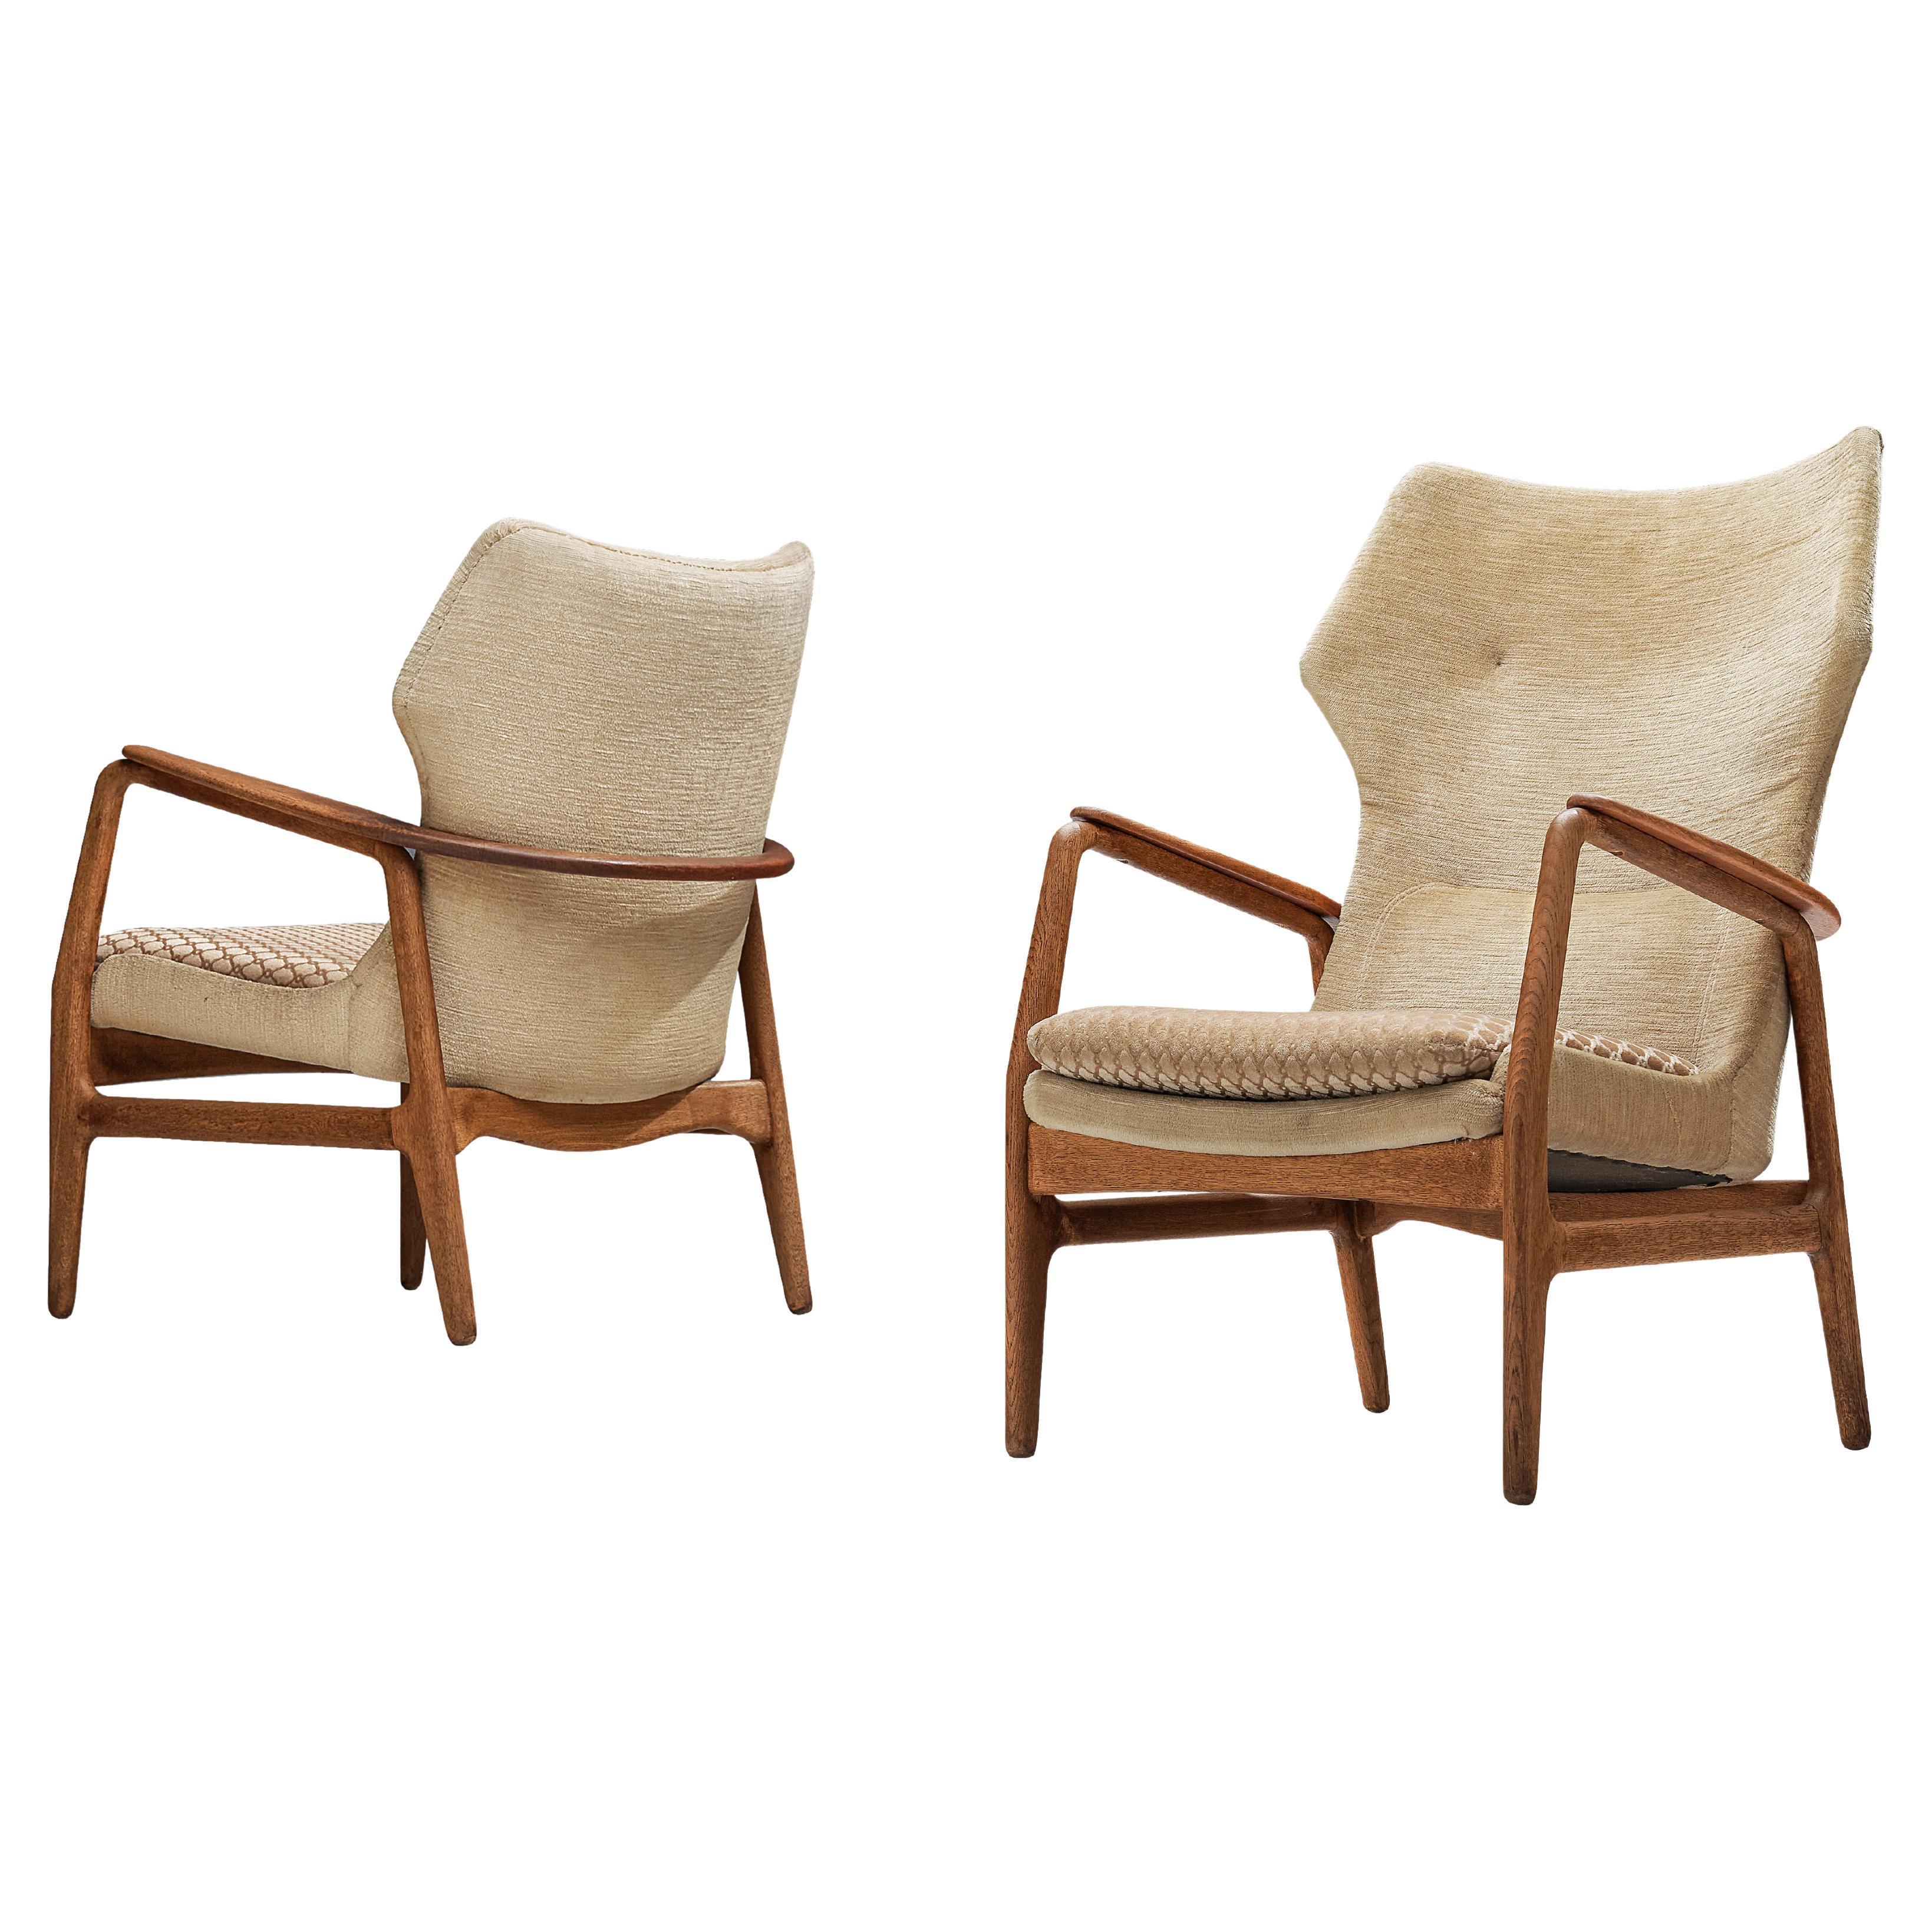 Aksel Bender Madsen for Bovenkamp Lounge Chairs in Oak and Teak